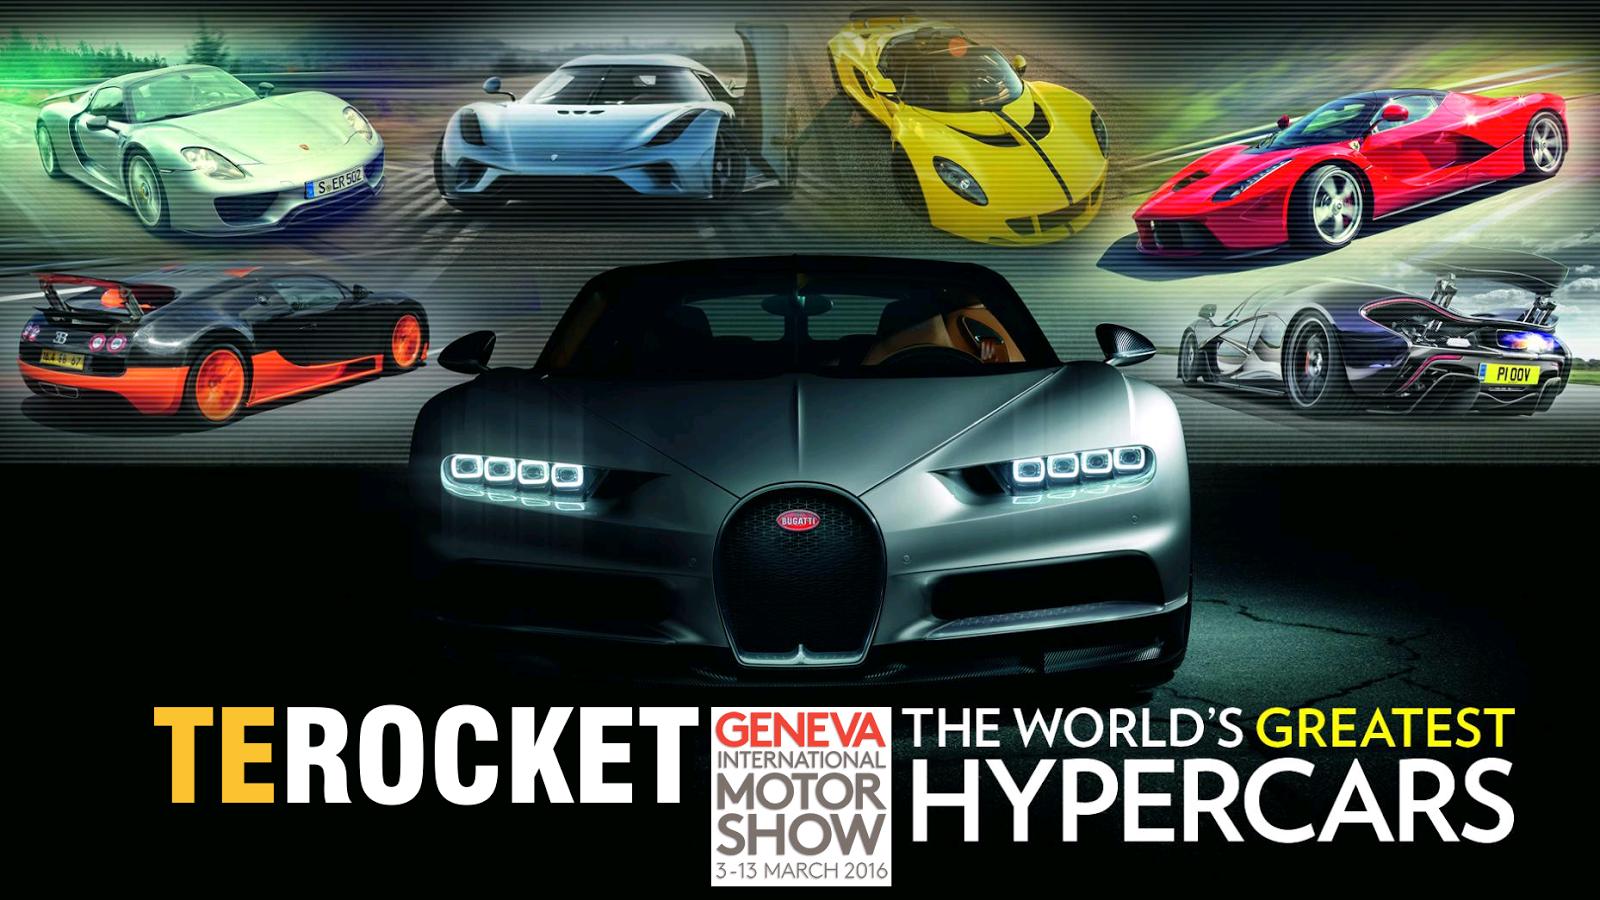 Geneva Motor Show 2016 từ A đến Z